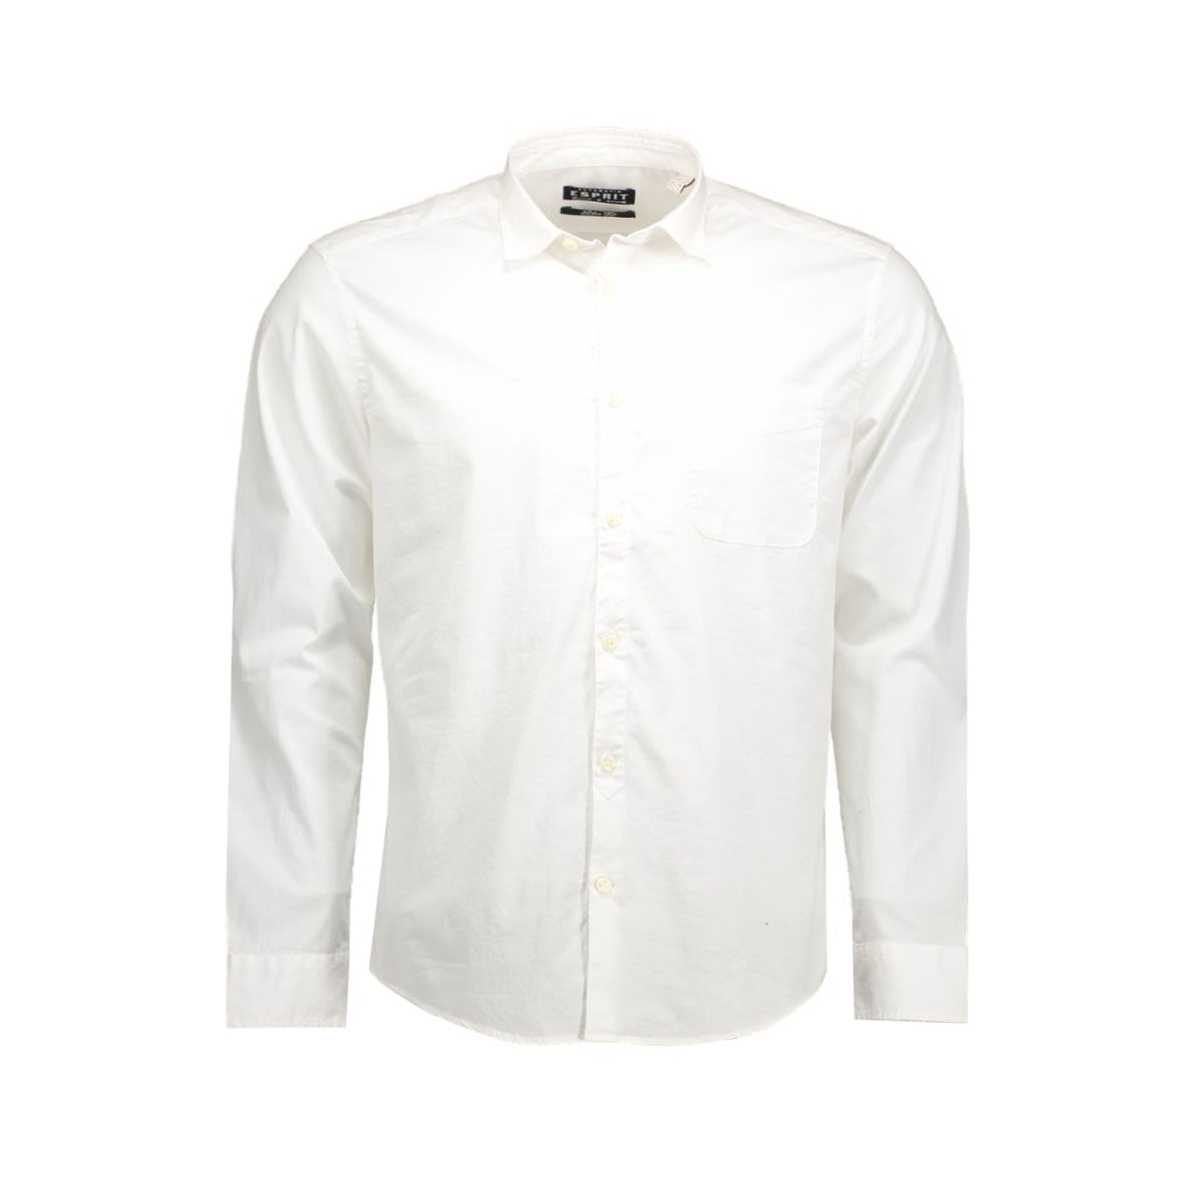 996ee2f901 esprit overhemd e100